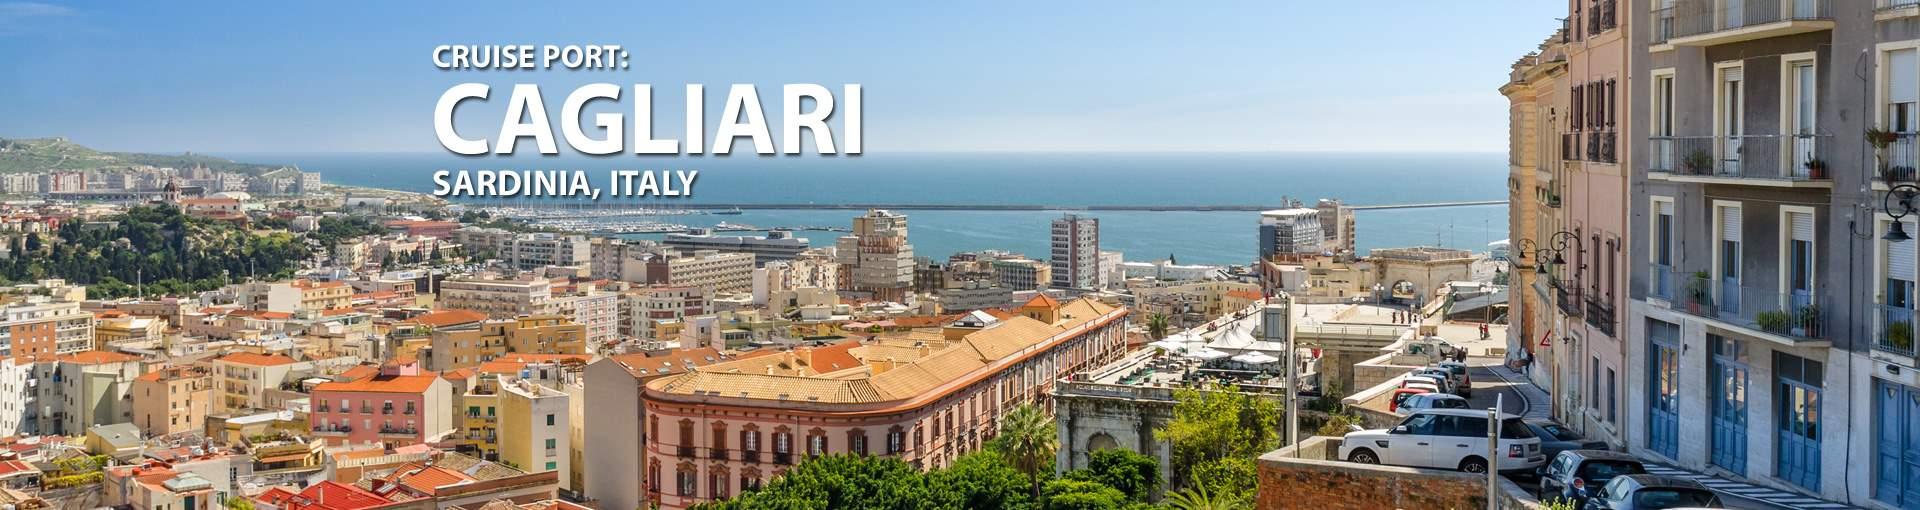 Cruises to Cagliari, Sardinia, Italy